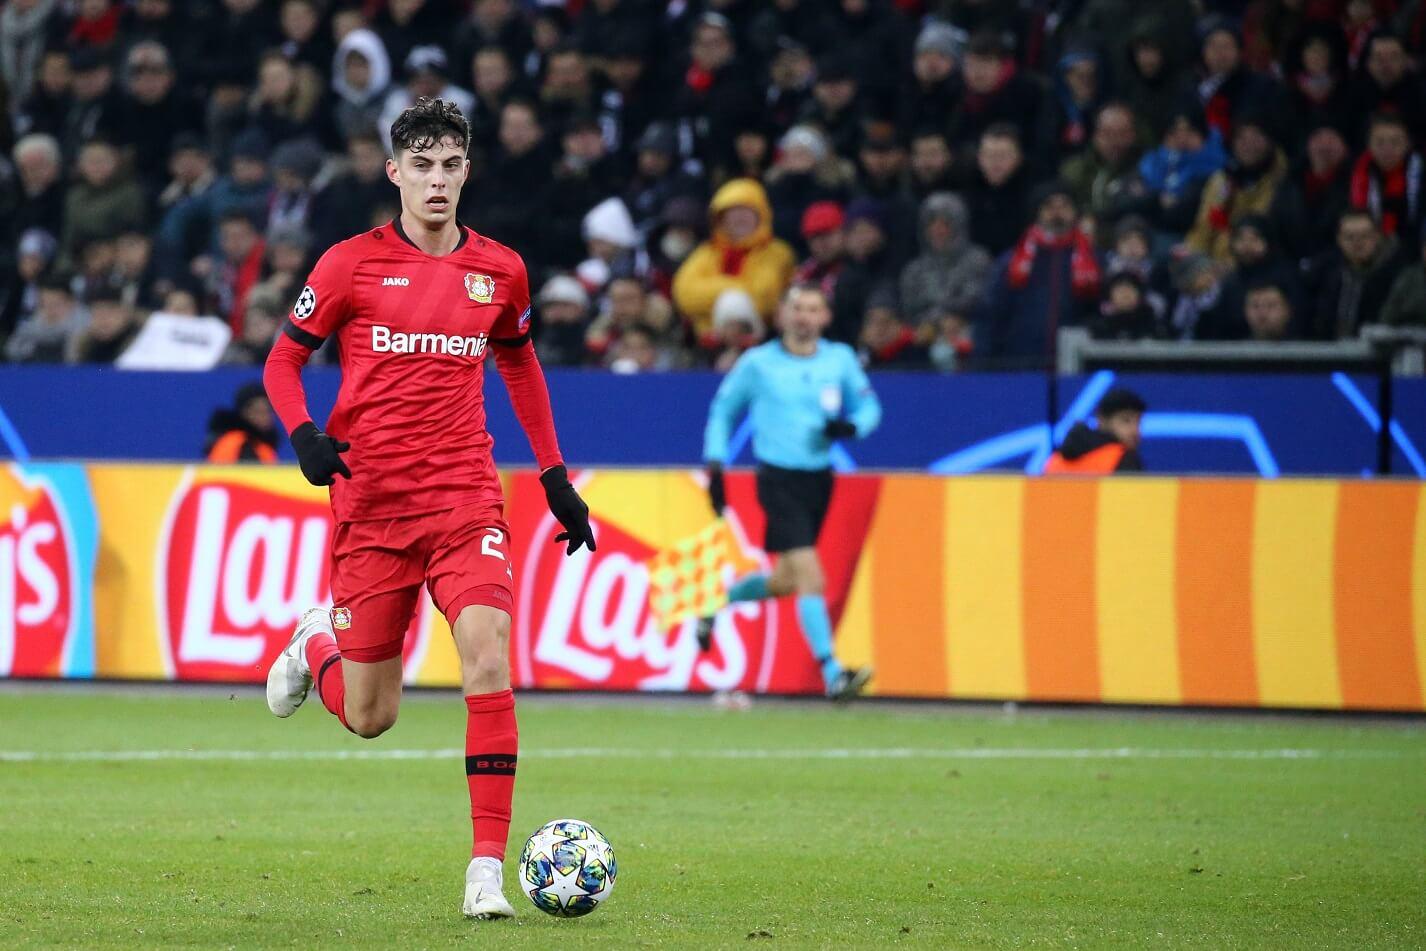 Bayer Leverkusen vs Juventus LM